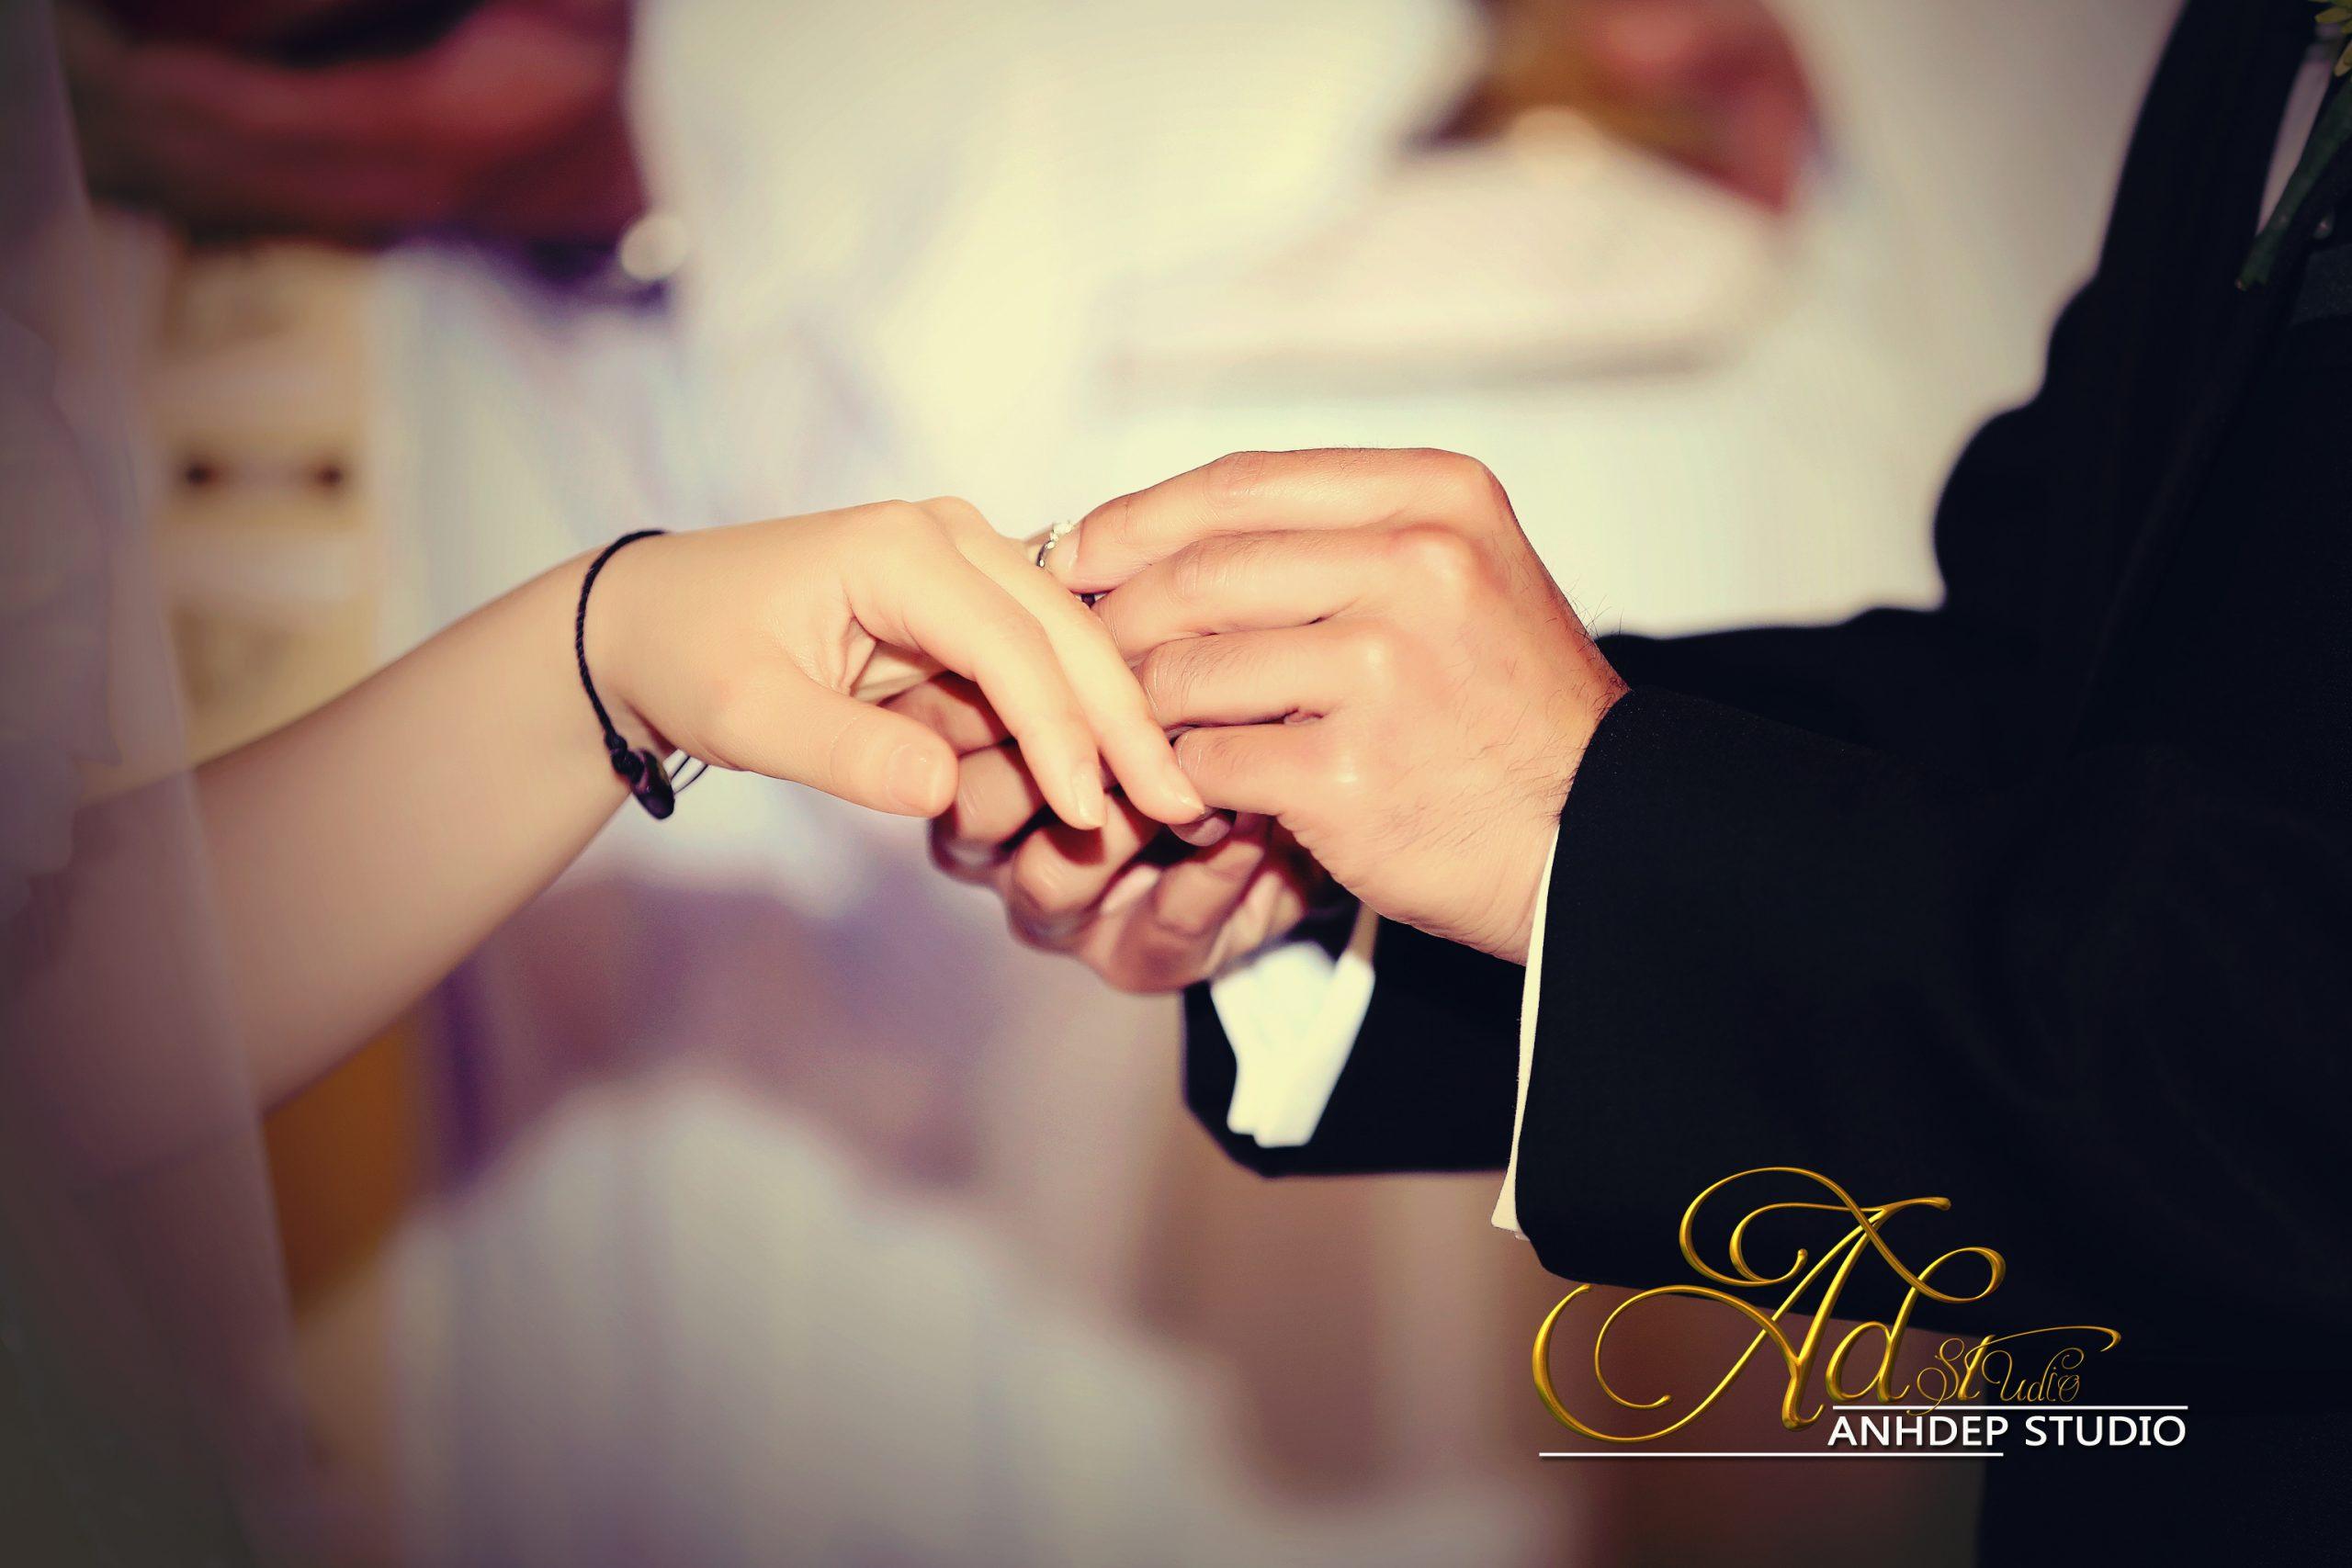 Phuc & Tuyen's  wedding